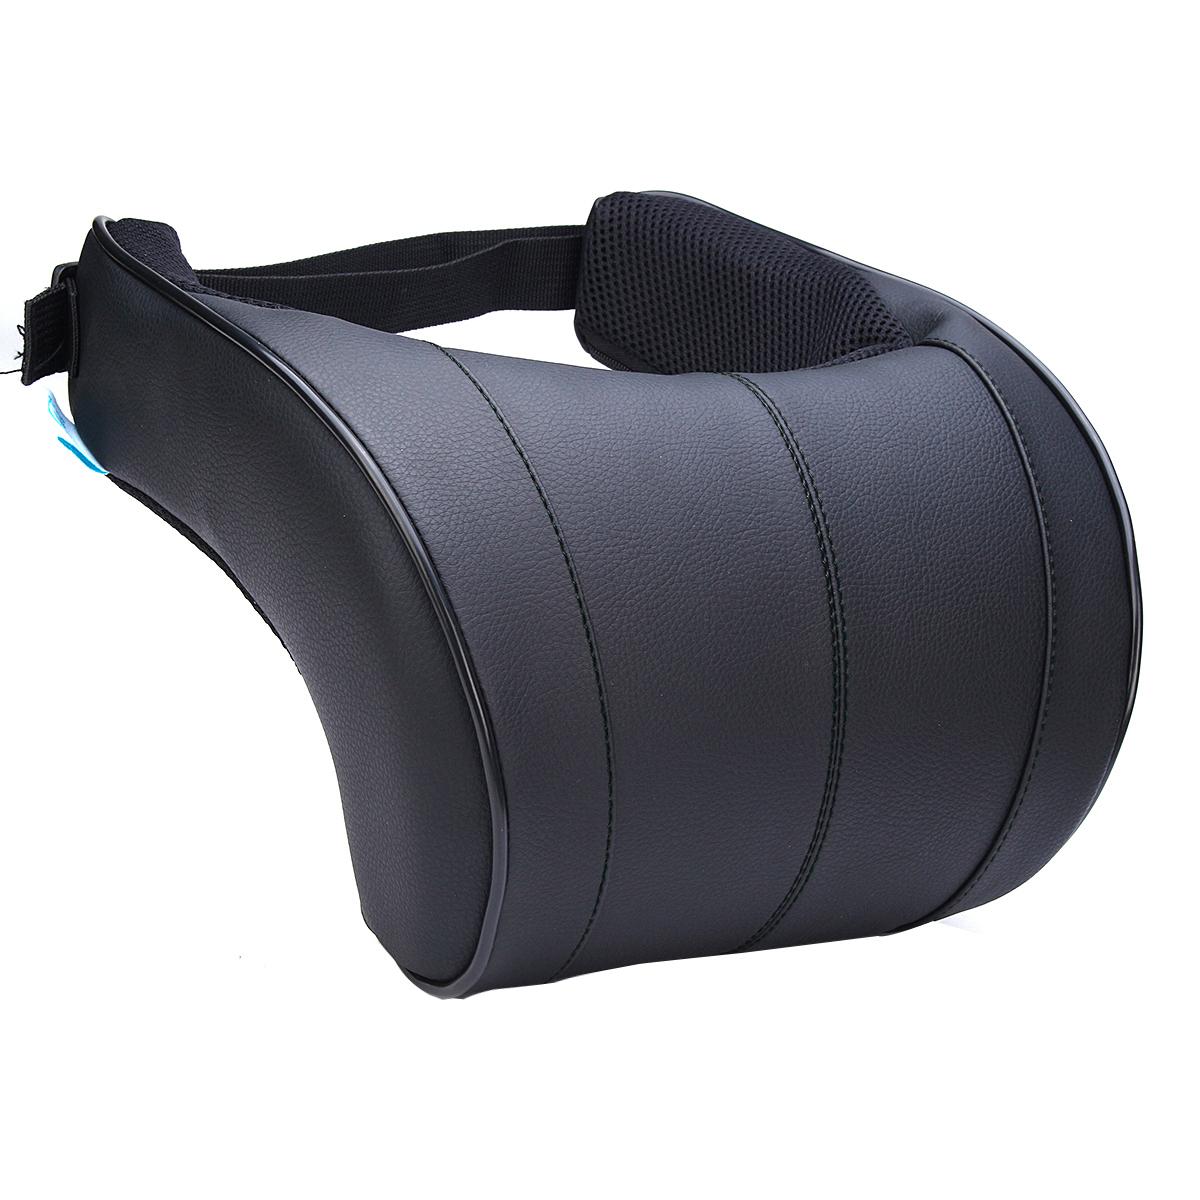 1PCS Pillows Head Neck Rest Headrest Support Cushion Memory Foam Pad Car Seat